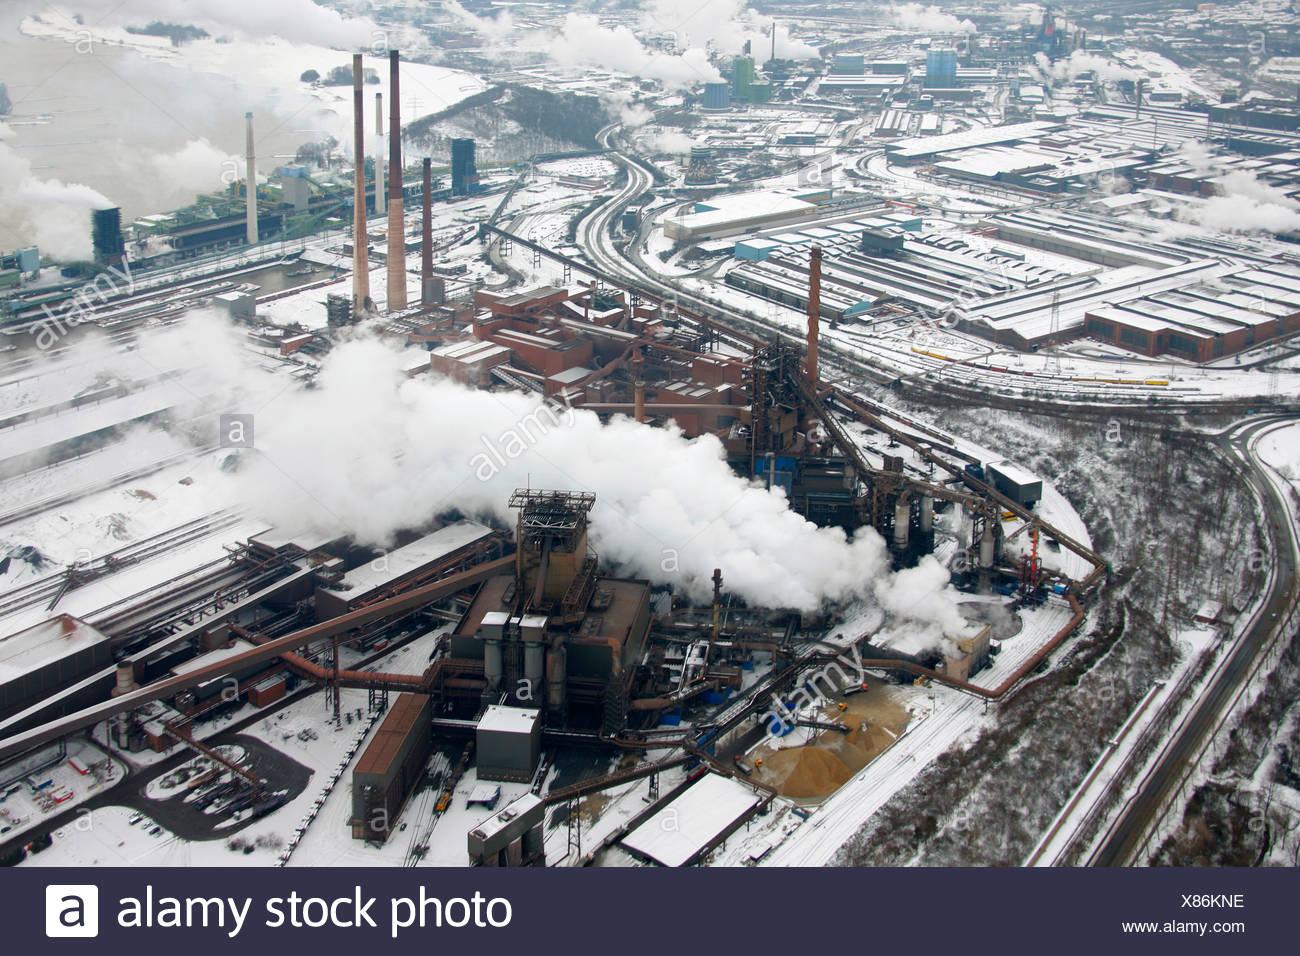 Aerial photo, steelworks, blast furnace 8, ThyssenKrupp Steel, Duisburg, Ruhr, North Rhine-Westphalia, Germany, Europe - Stock Image